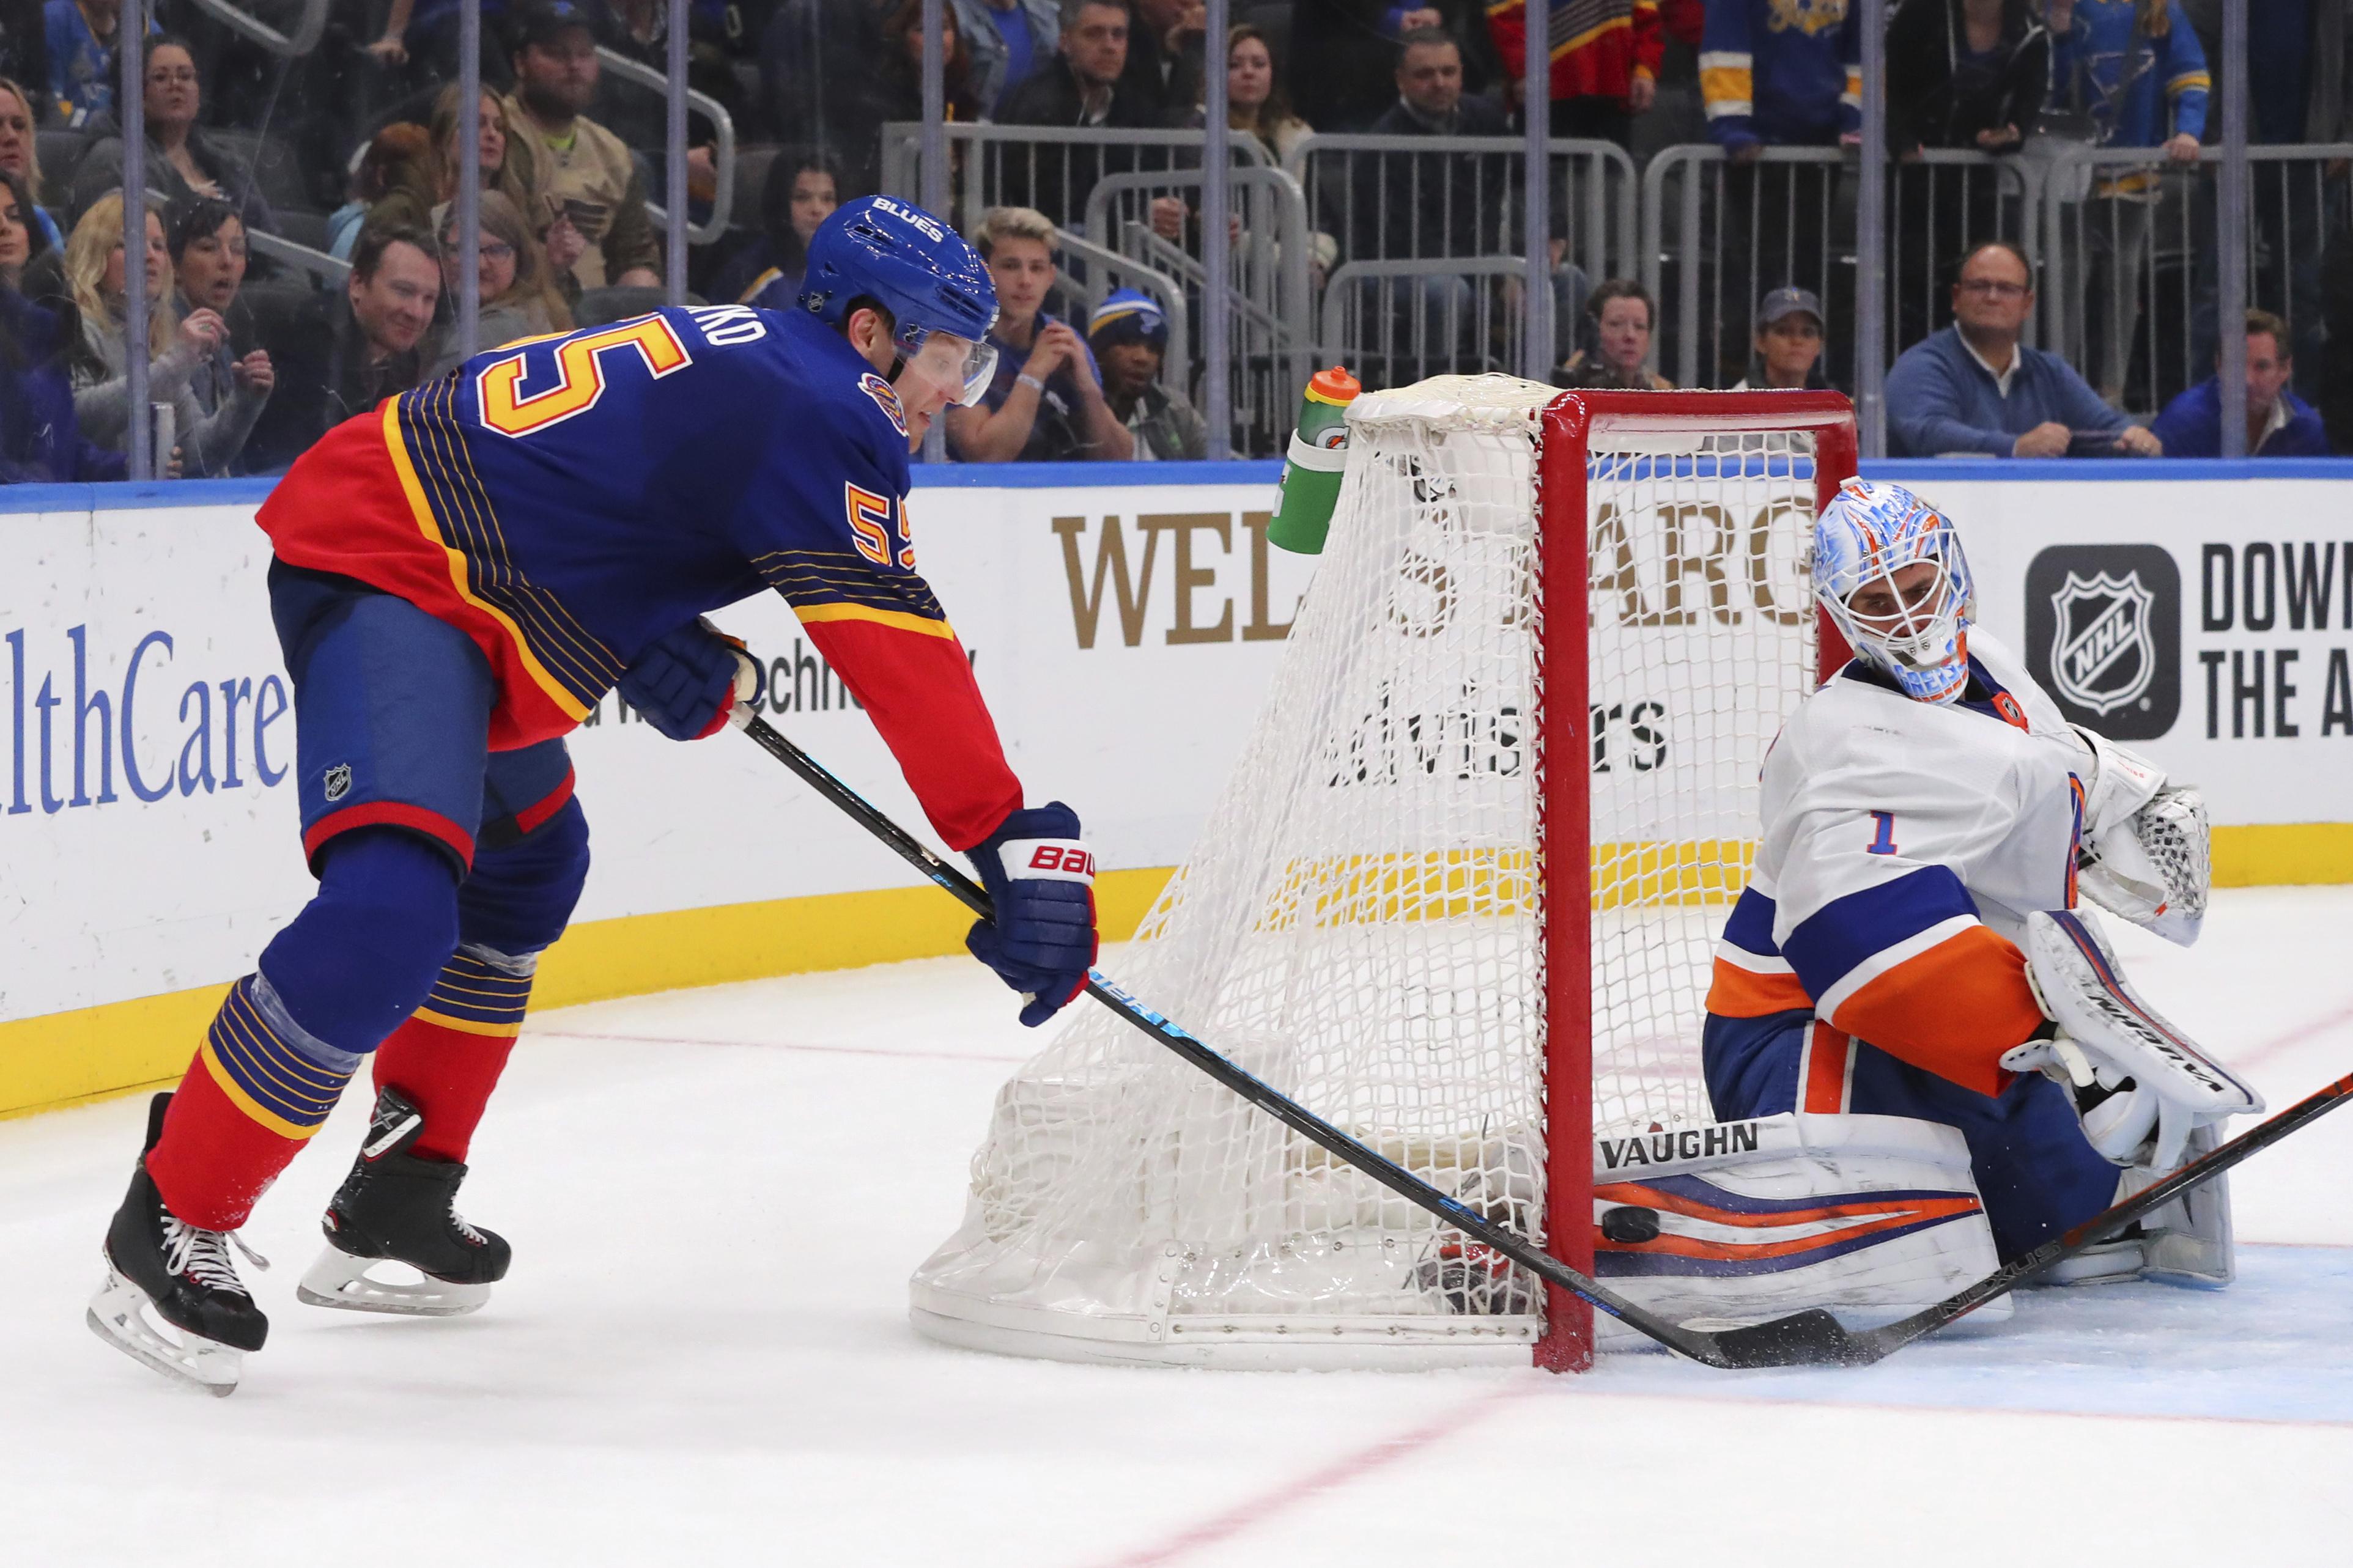 Parayko lifts Blues to 3-2 win over Islanders in OT